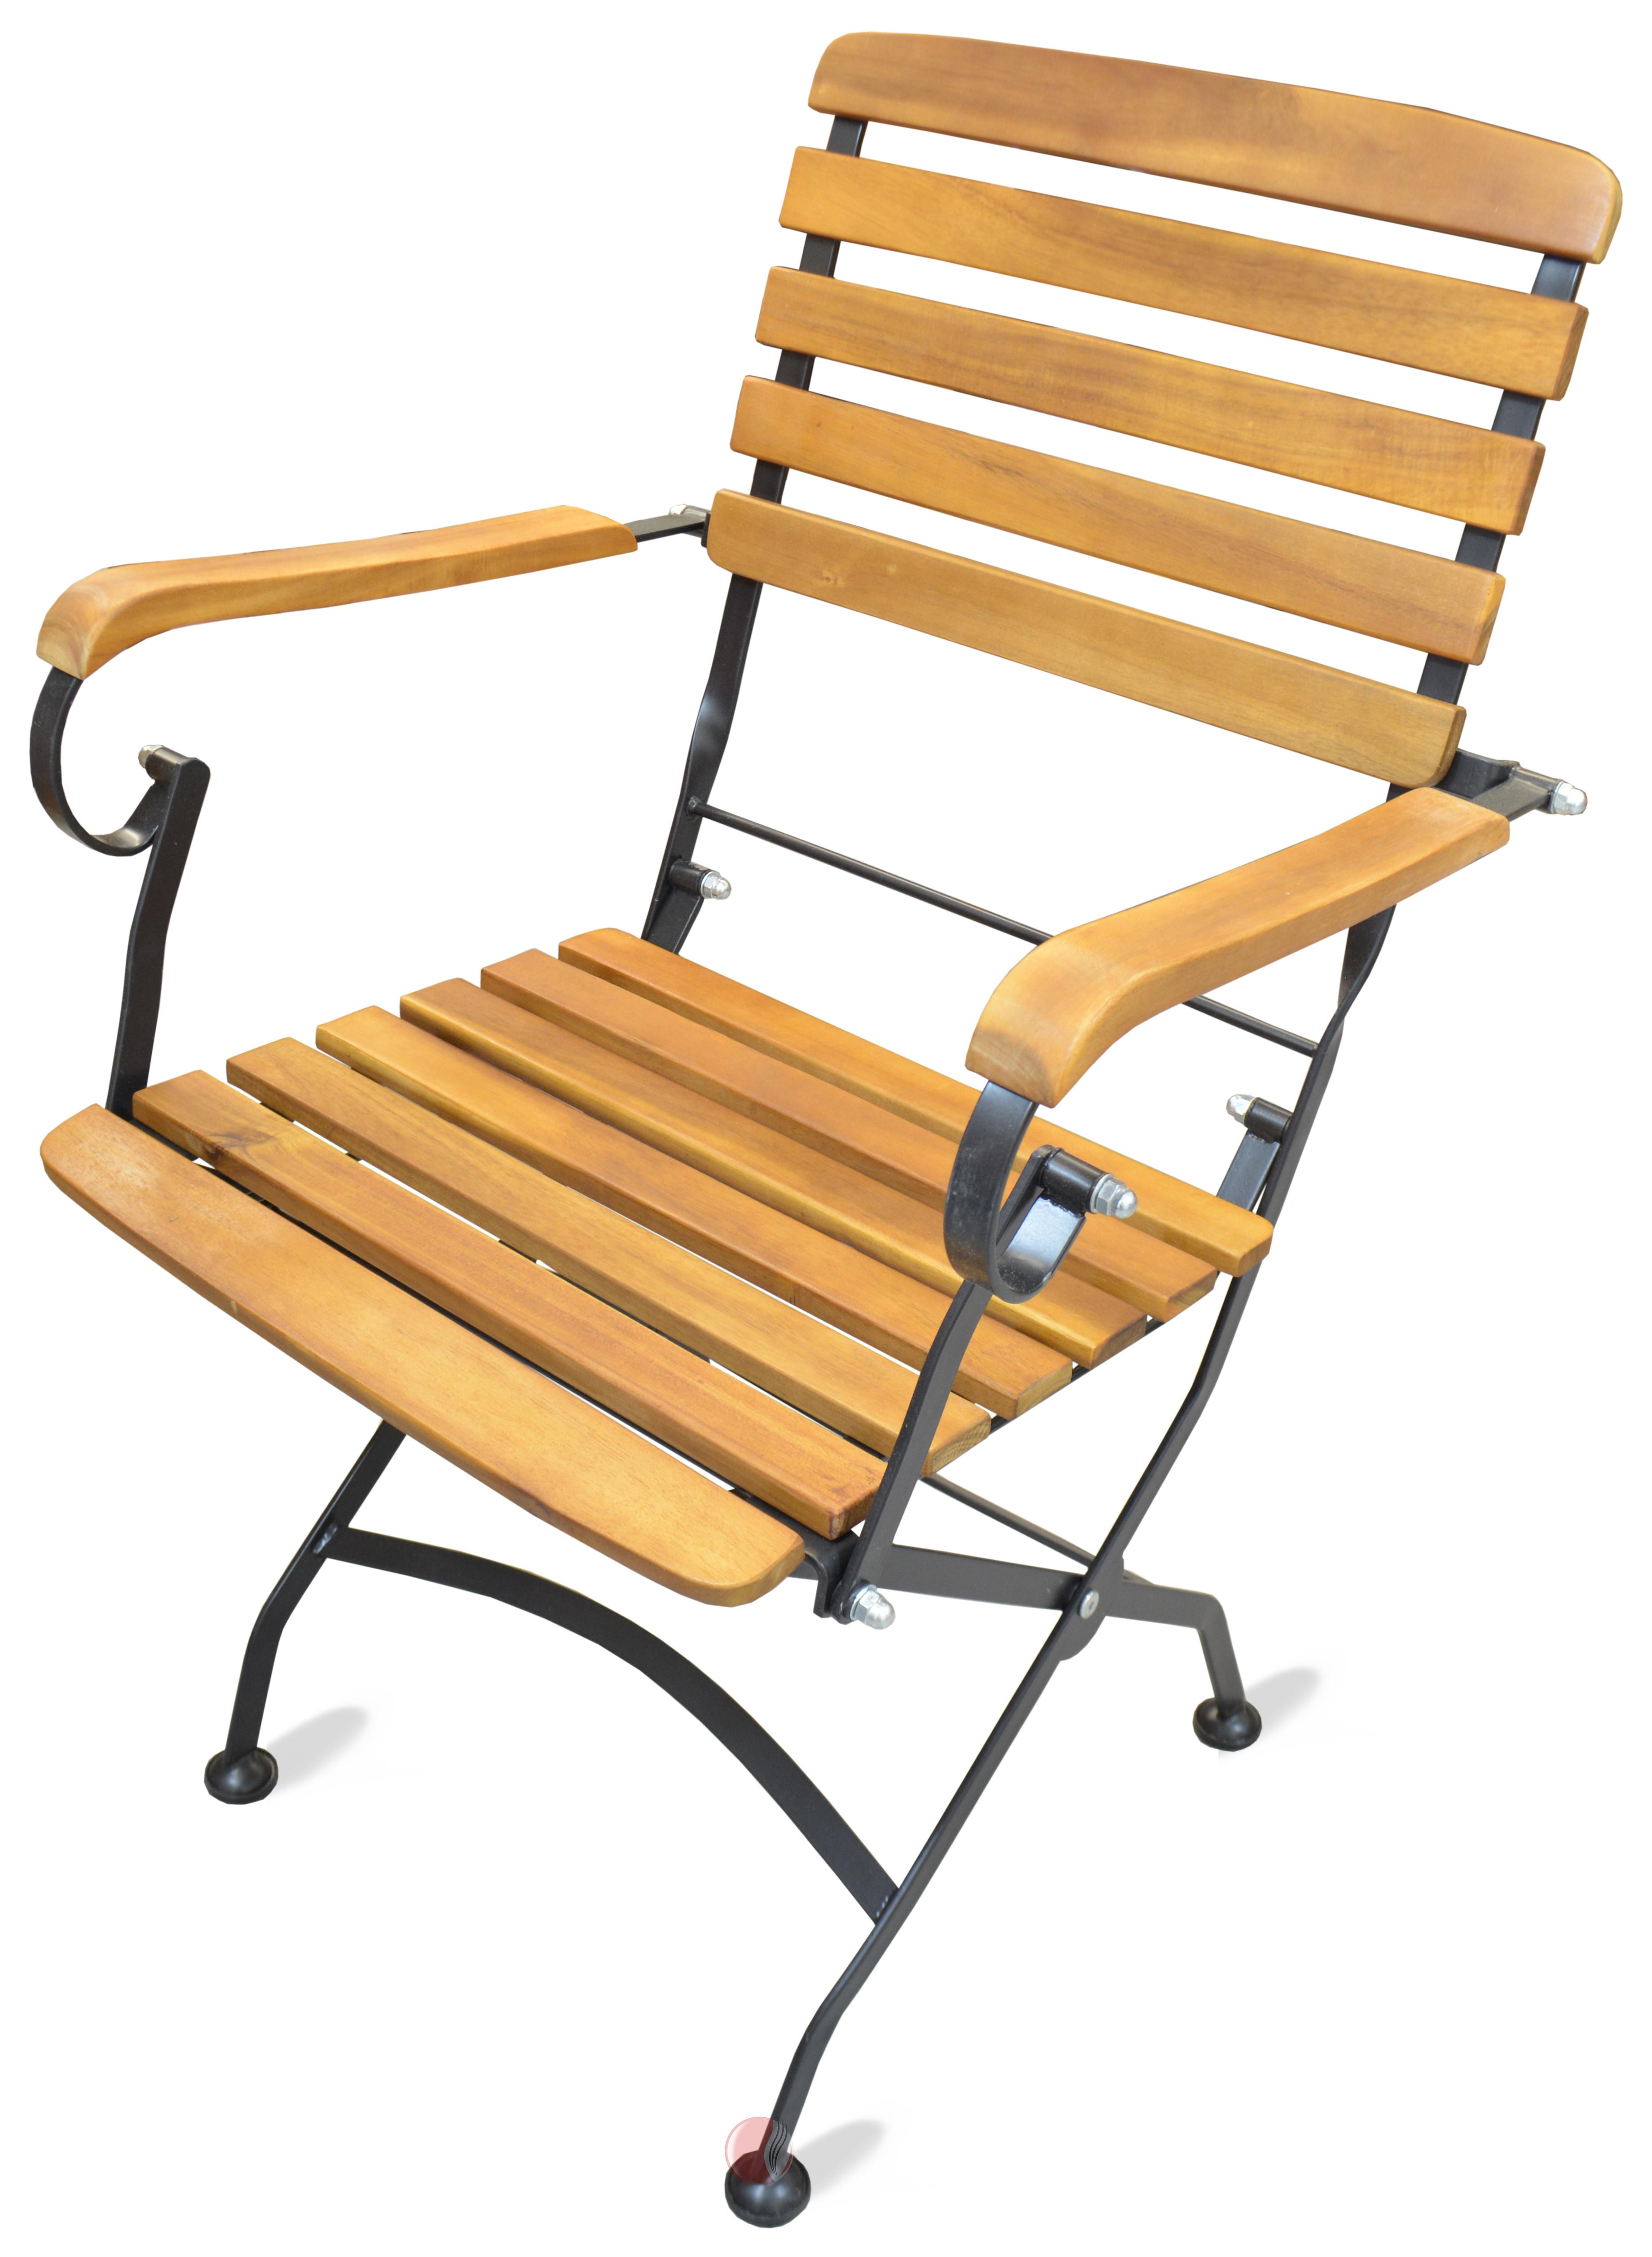 biergarten stuhl outdoor stuhl riki mit armlehne. Black Bedroom Furniture Sets. Home Design Ideas